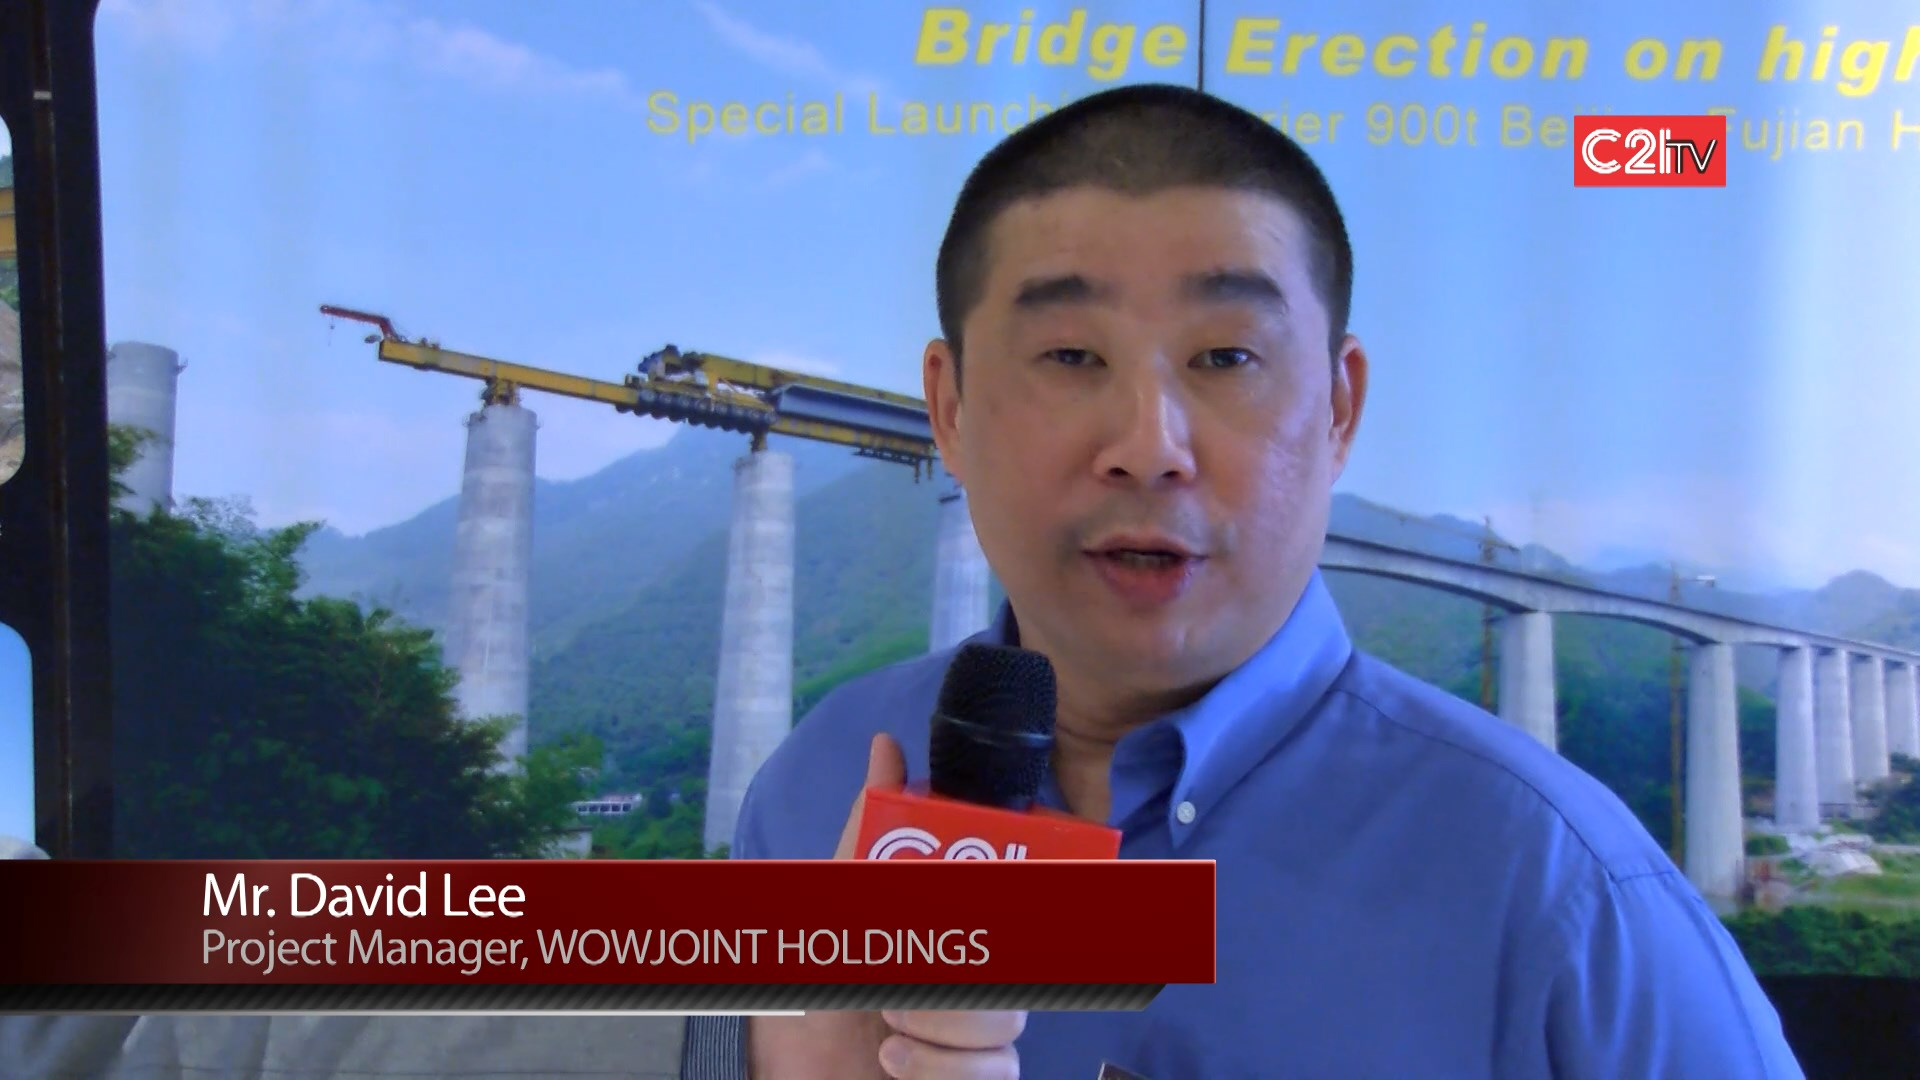 Wowjoint Holdings